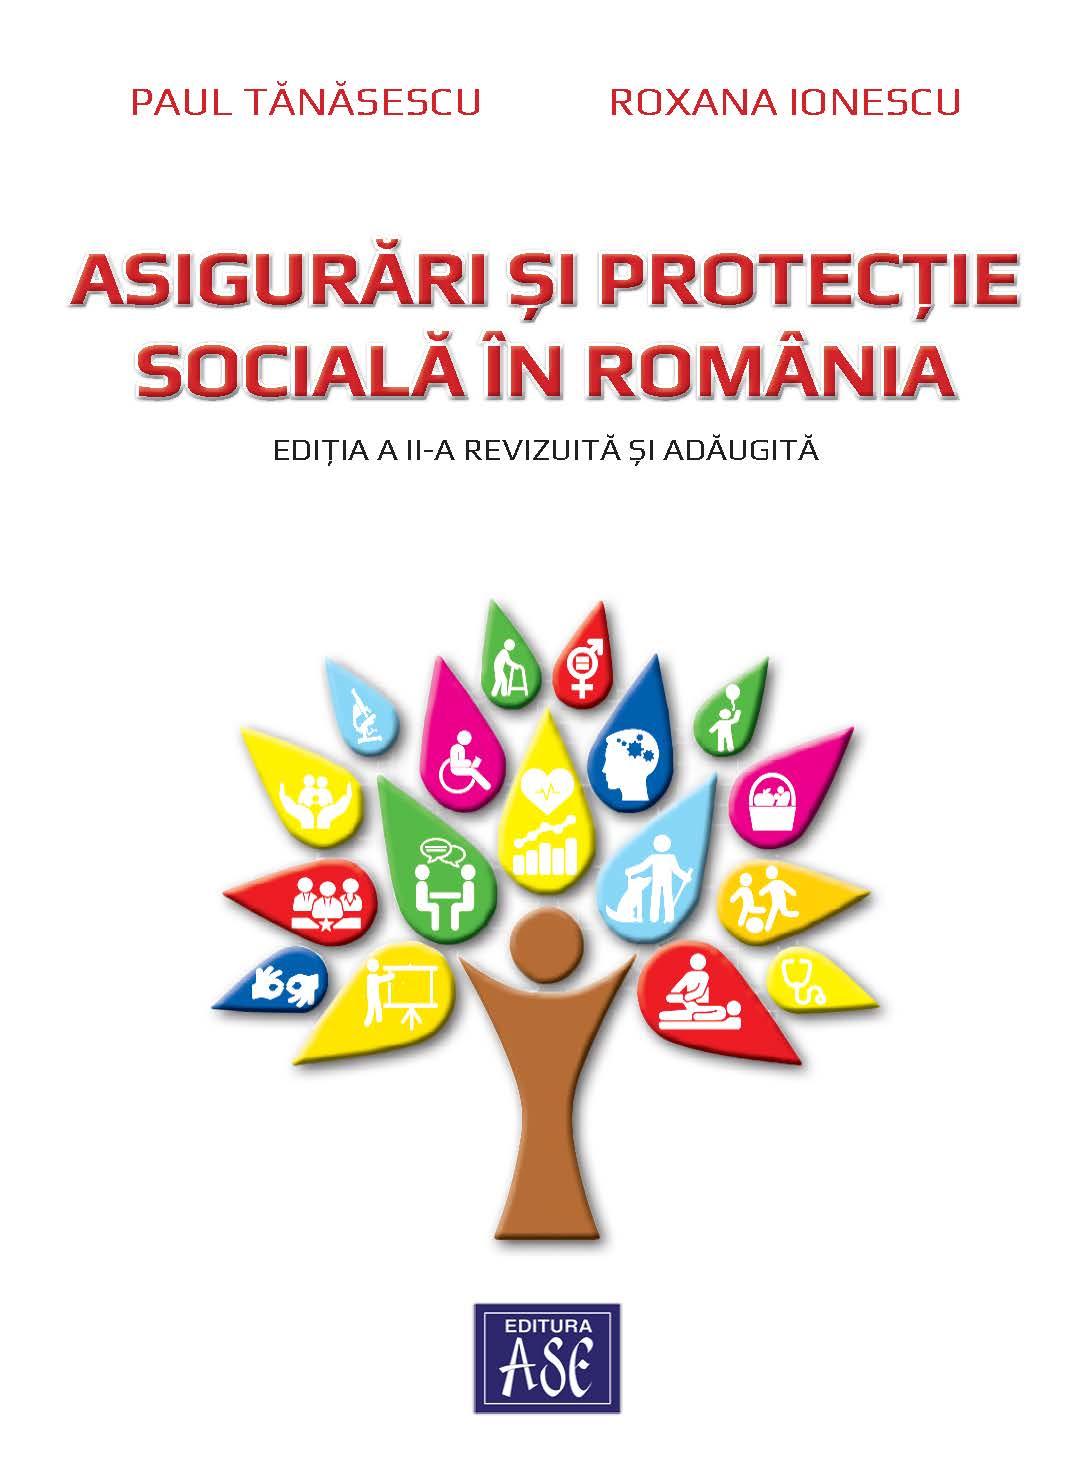 Asigurari si protectie sociala in Romania, editia a II-a revizuita si adaugita